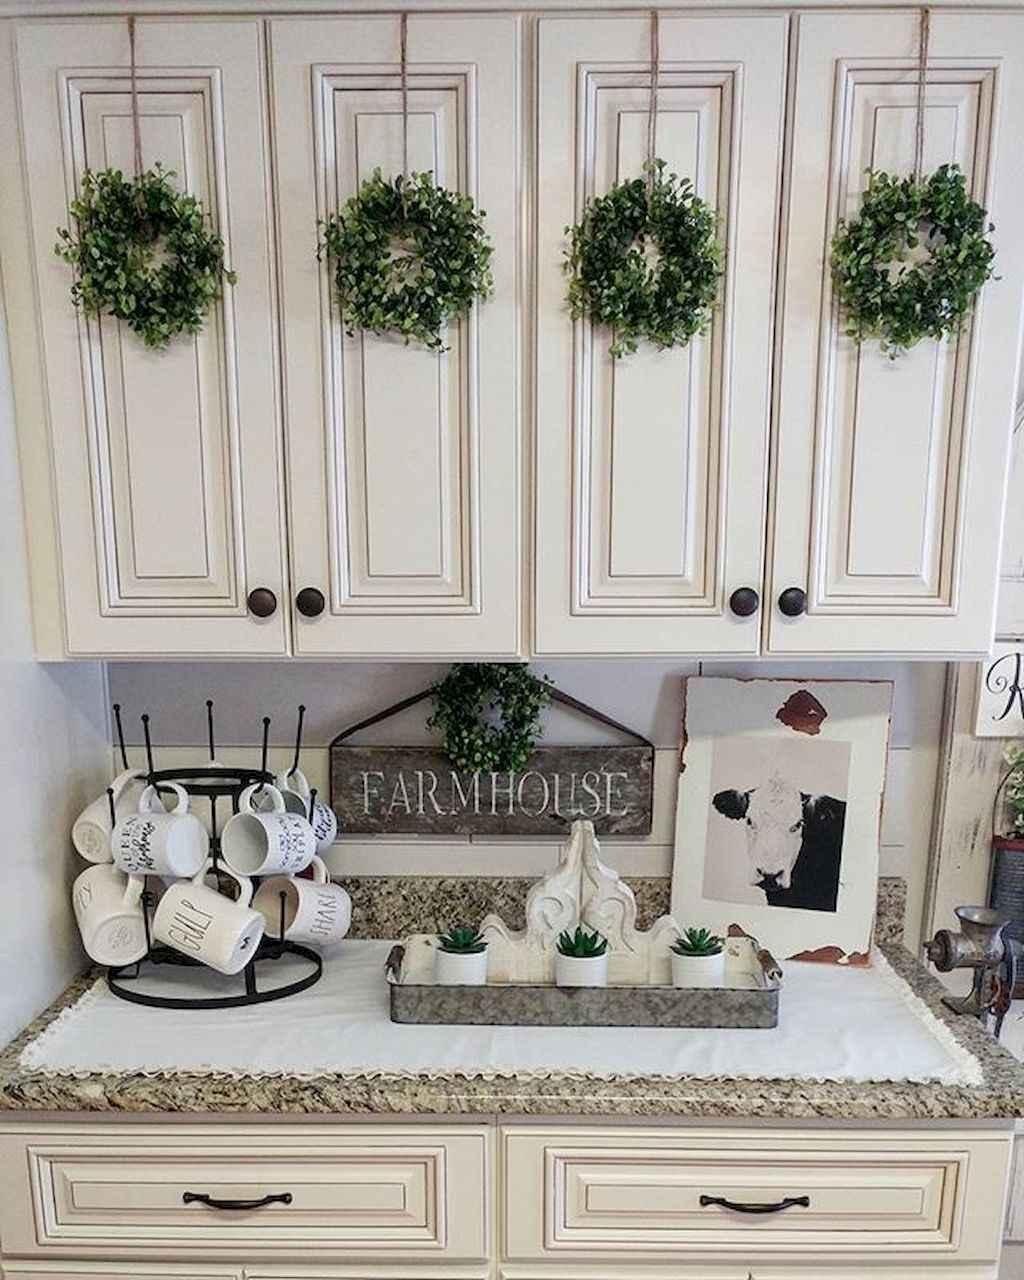 Kitchen Cabinet Design Ideas 2018: Best 100 White Kitchen Cabinets Decor Ideas For Farmhouse